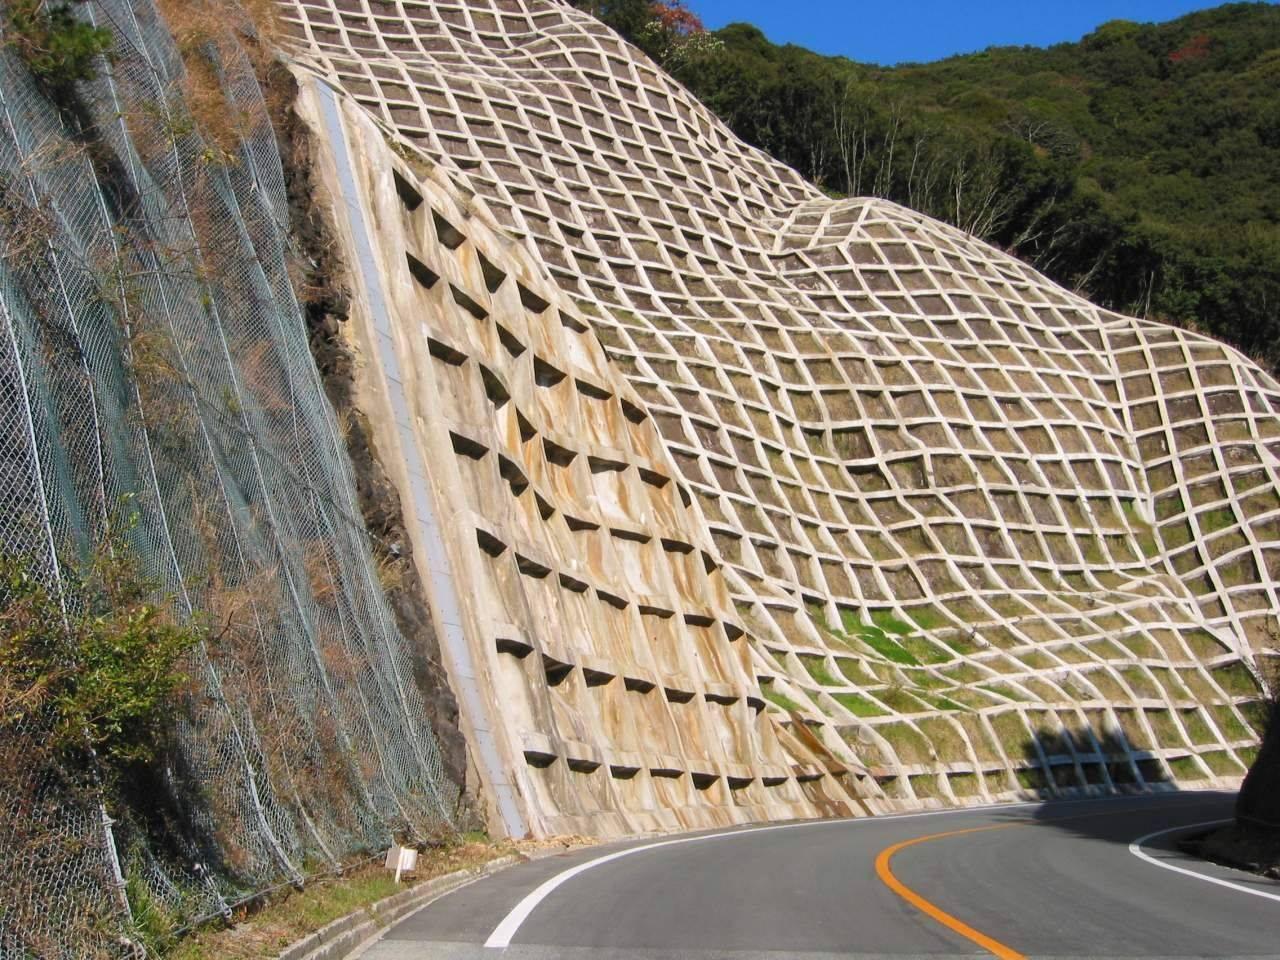 Figure 1: Concrete retaining walls in Japan